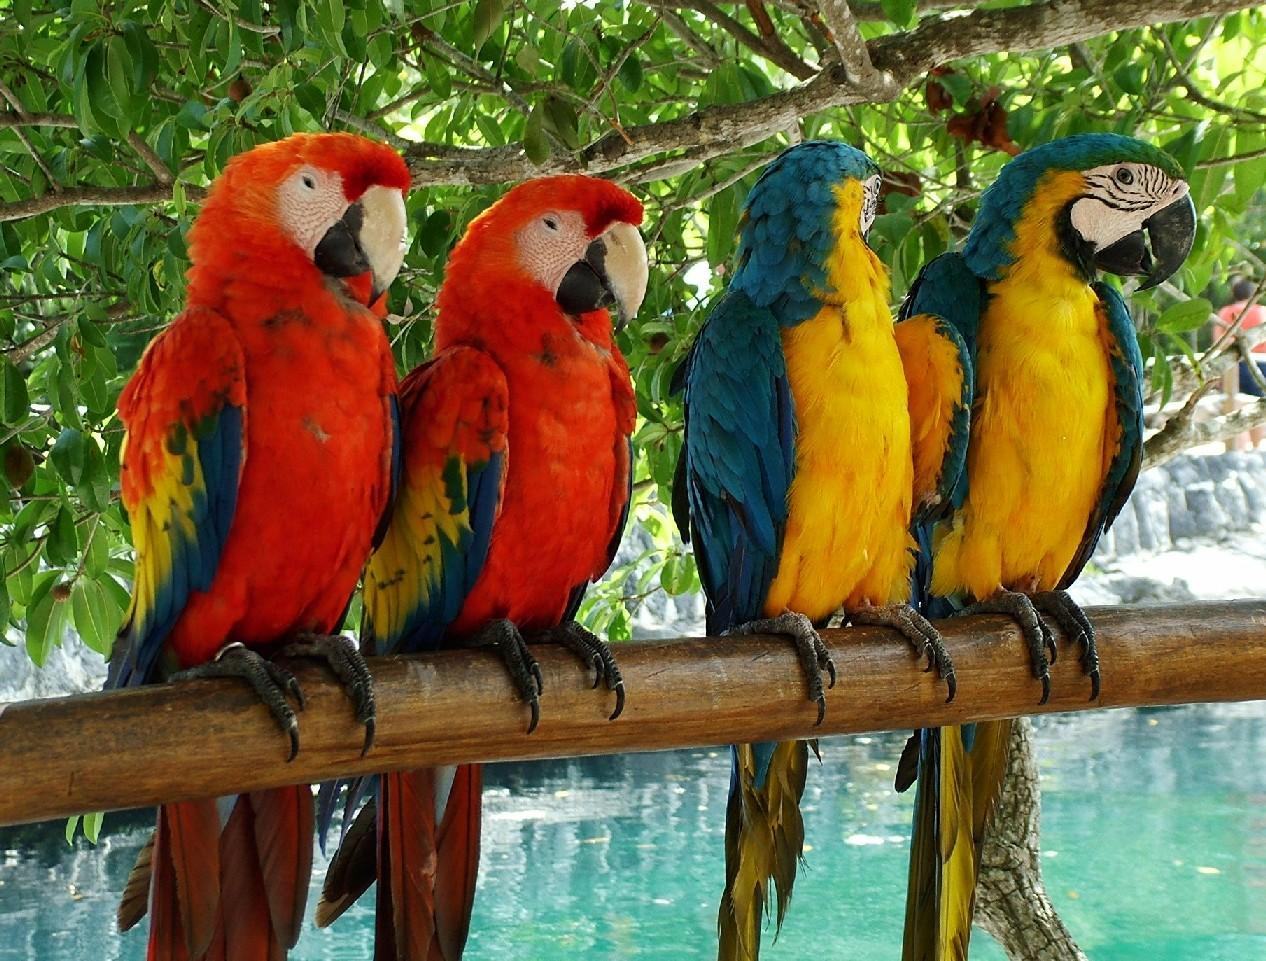 tropical bird wallpaper for walls - photo #19